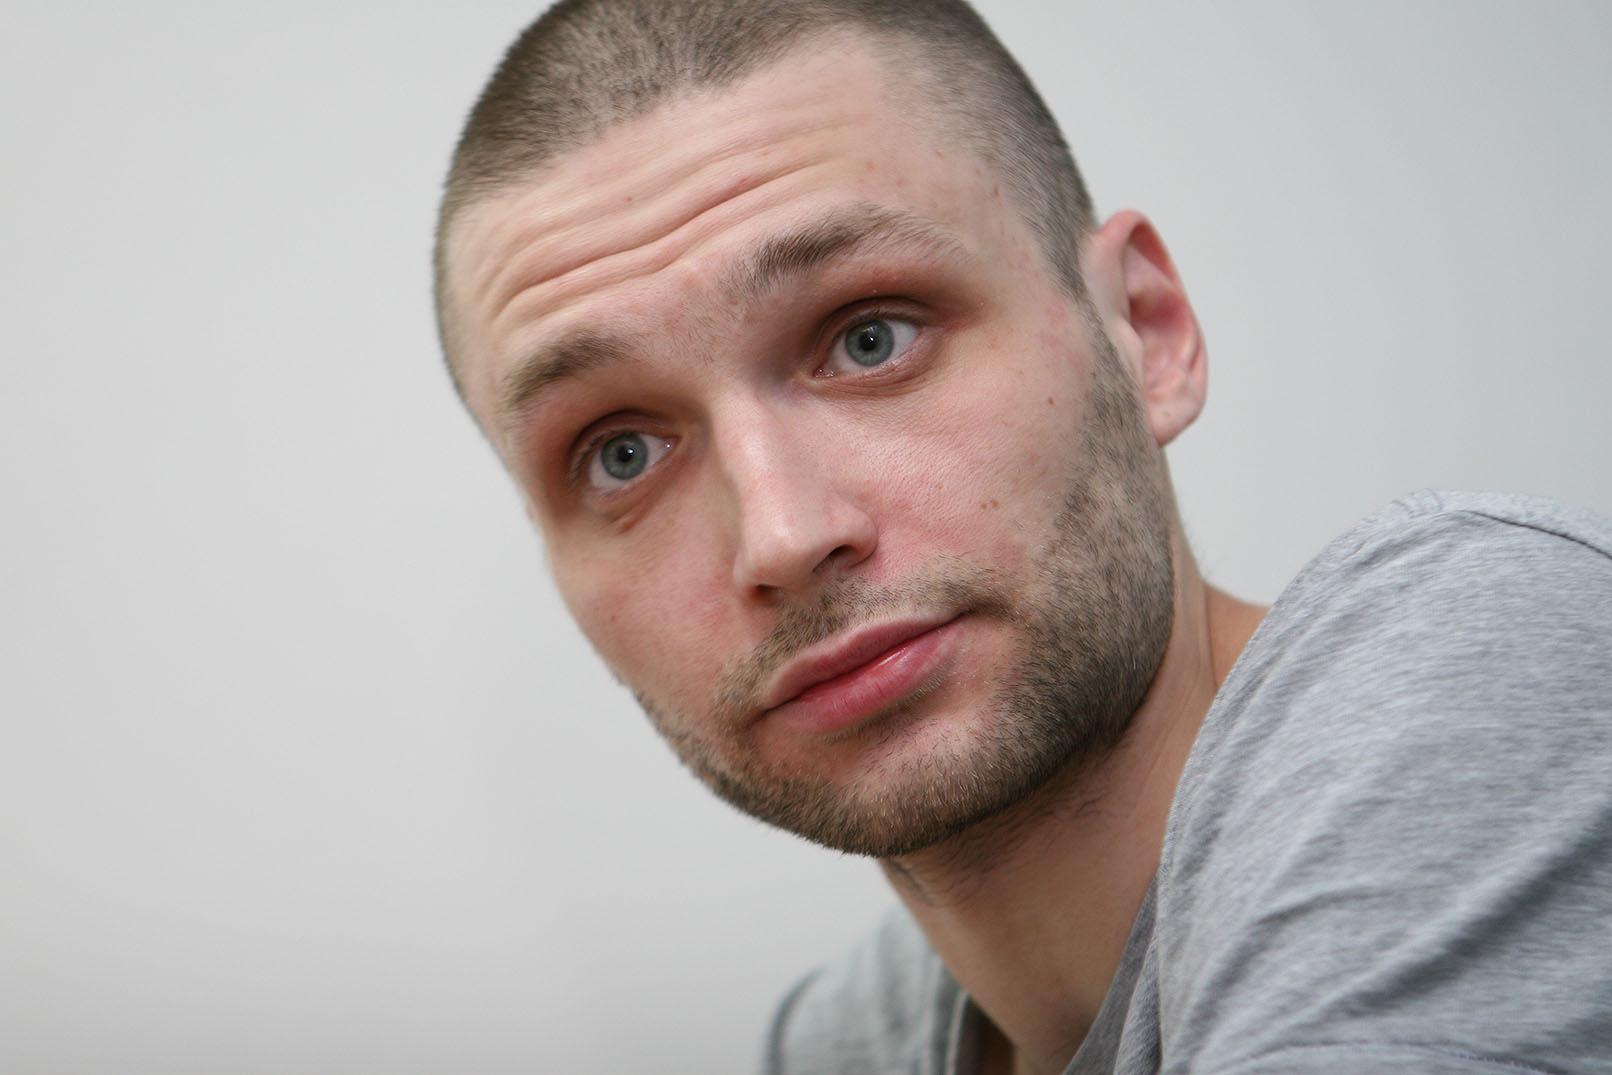 Рэпер-беглец Роман Баскин: «Город без наркотиков» наркоманов не лечит»